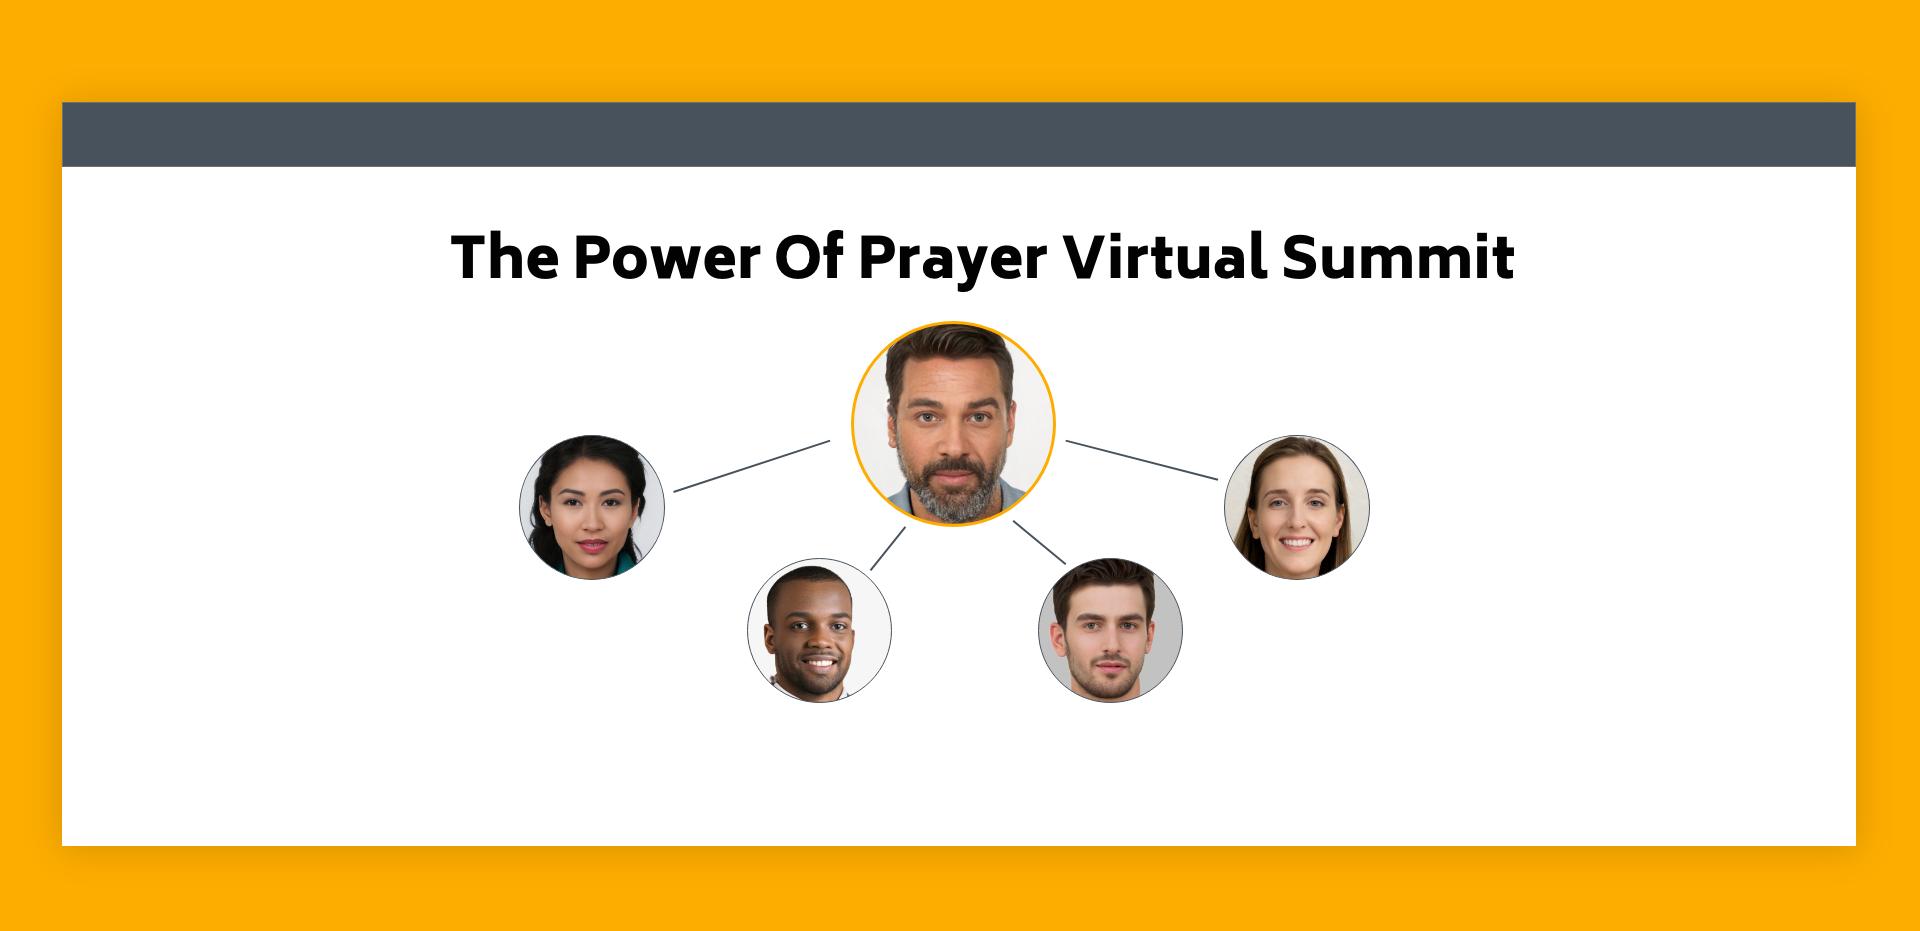 Delmethods virtual summits for churches